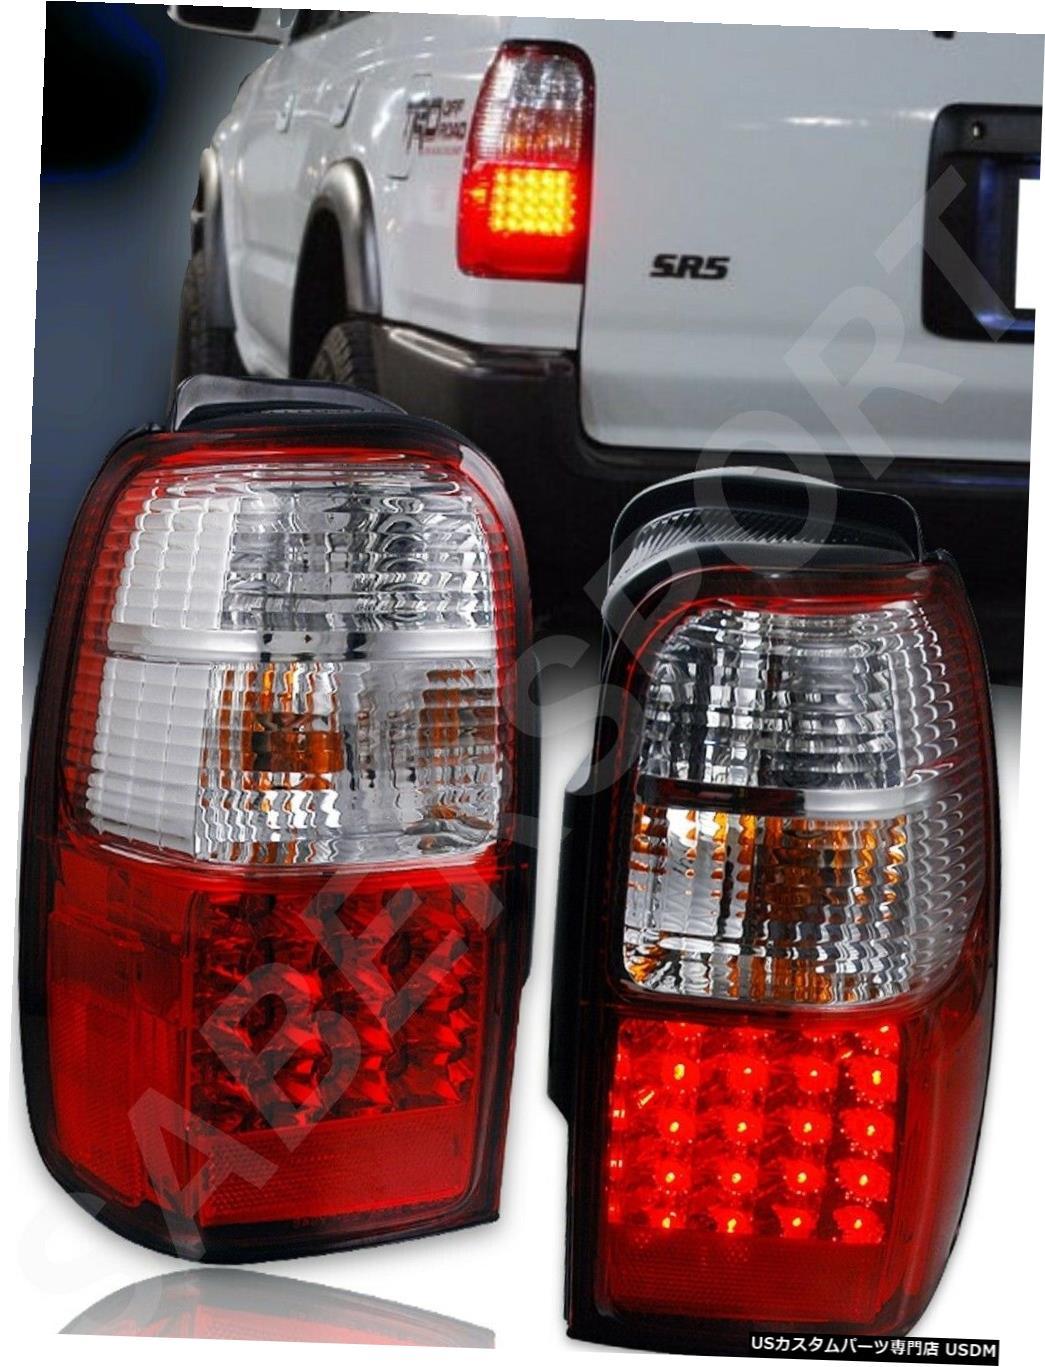 Tail light 1996-2002 Toyota 4Runnerのペアの赤いレンズLEDテールライトのセット Set of Pair Red Lens LED Taillights for 1996-2002 Toyota 4Runner